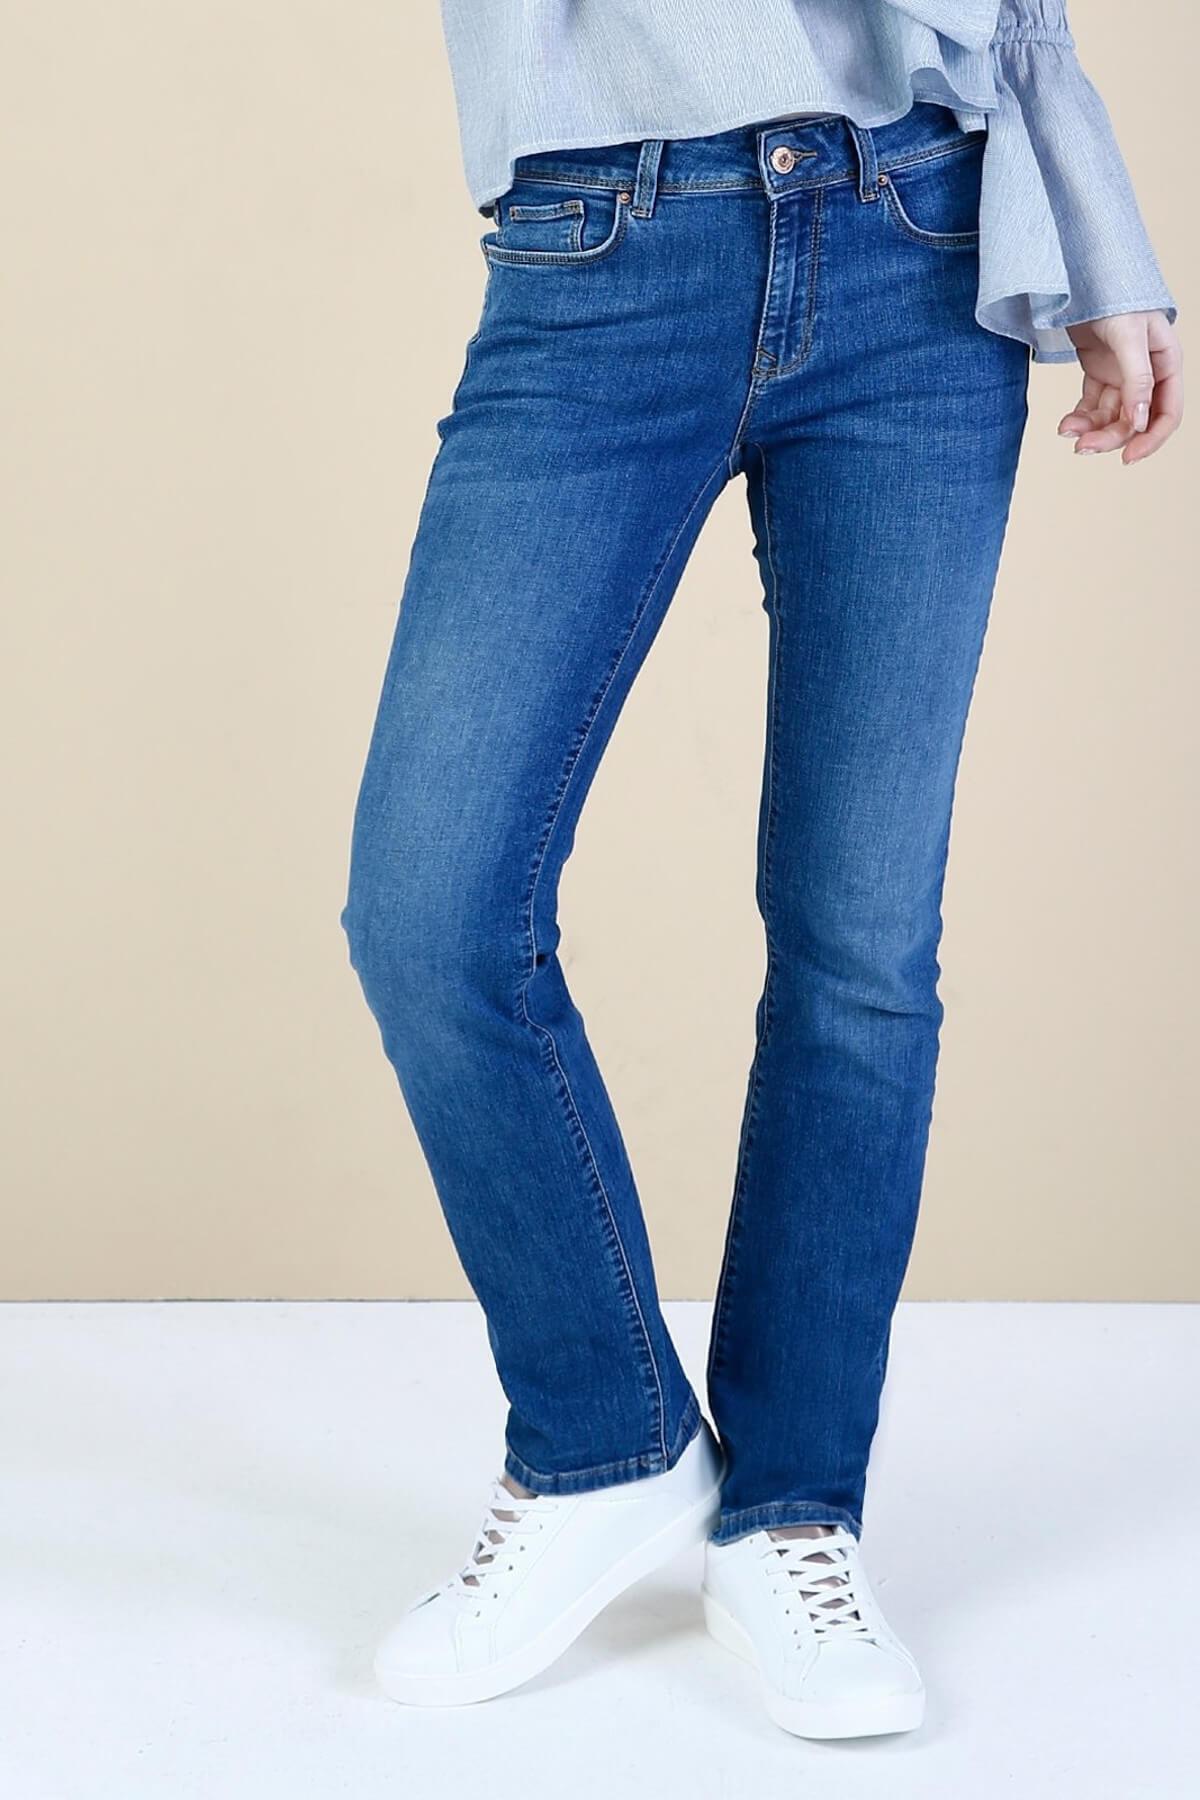 KADIN 792 Mıla Orta Bel Düz Paça Regular Fit Mavi Kadın Jean Pantolon CL1034581